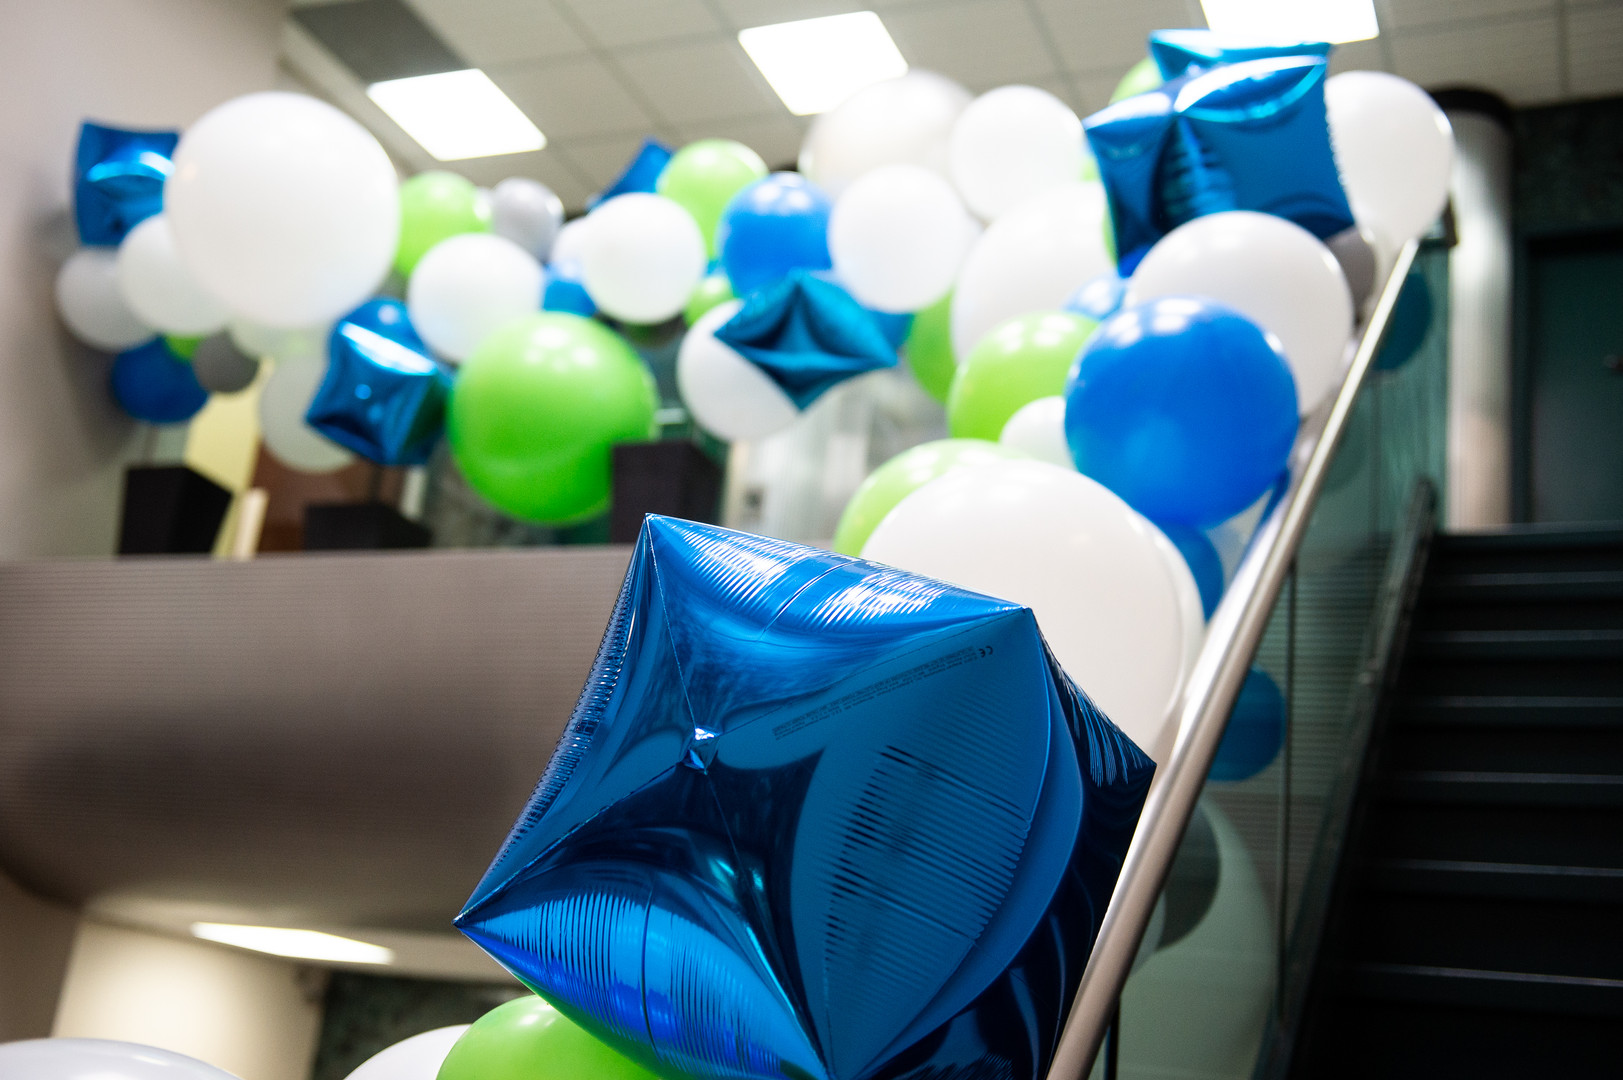 Balloon Installation on office building staircase